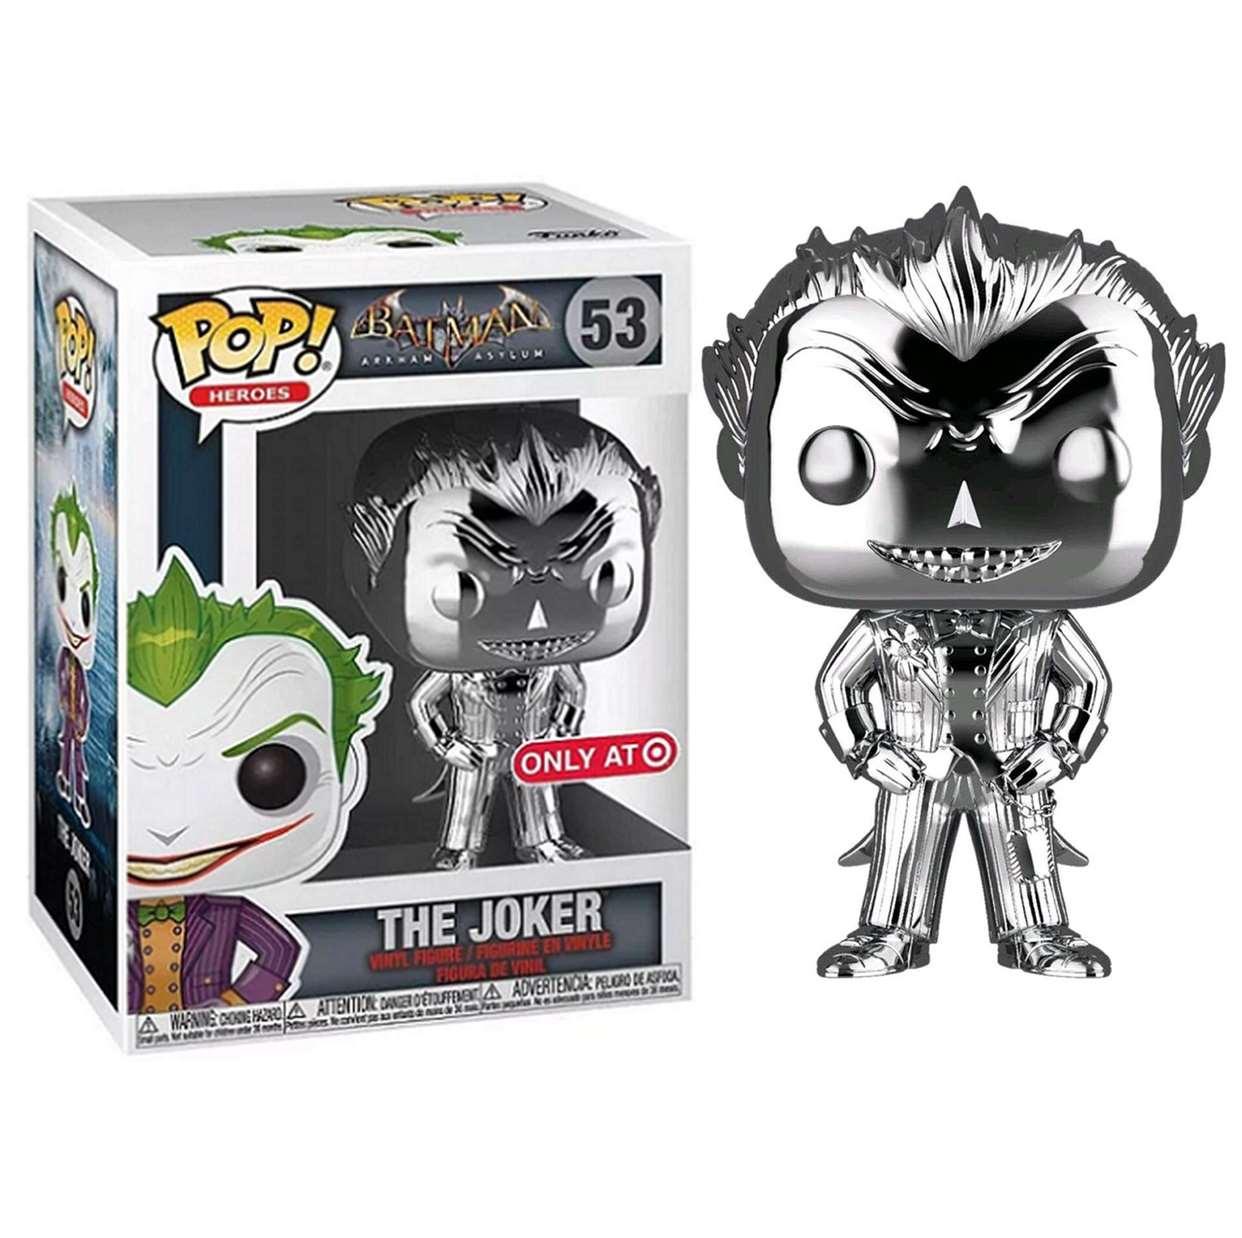 The Joker Gray #53 Batman Arkham Asylum Funko Pop! Exclusivo Target